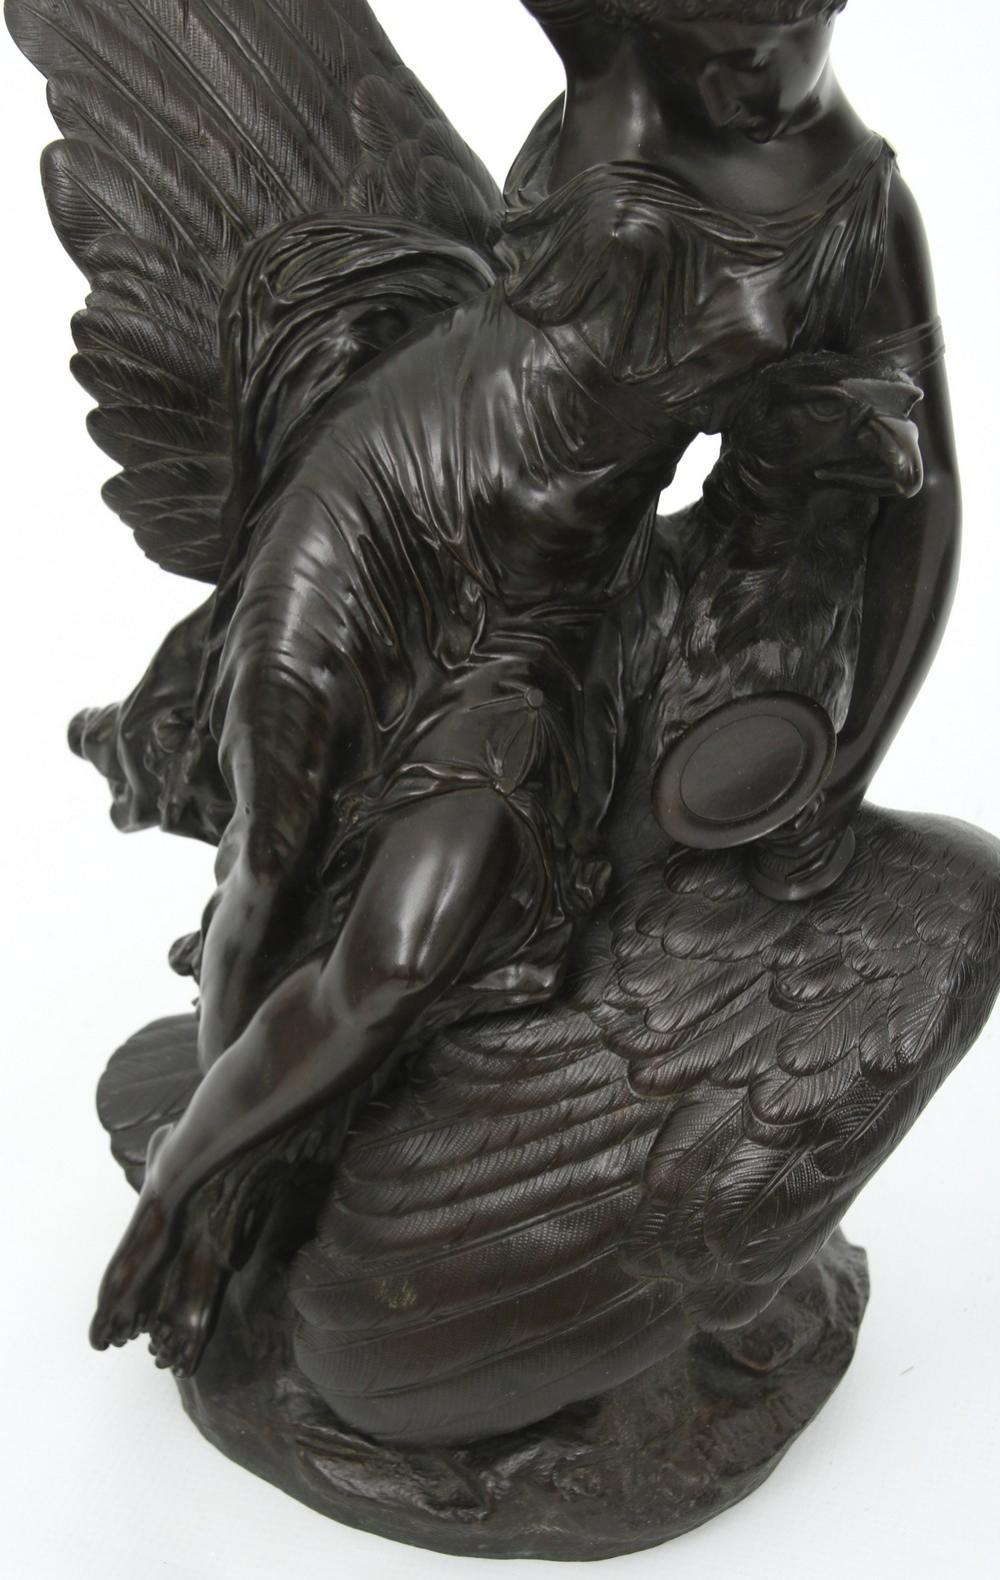 Louis Charles Hippolyte Buhot (1815-1865)